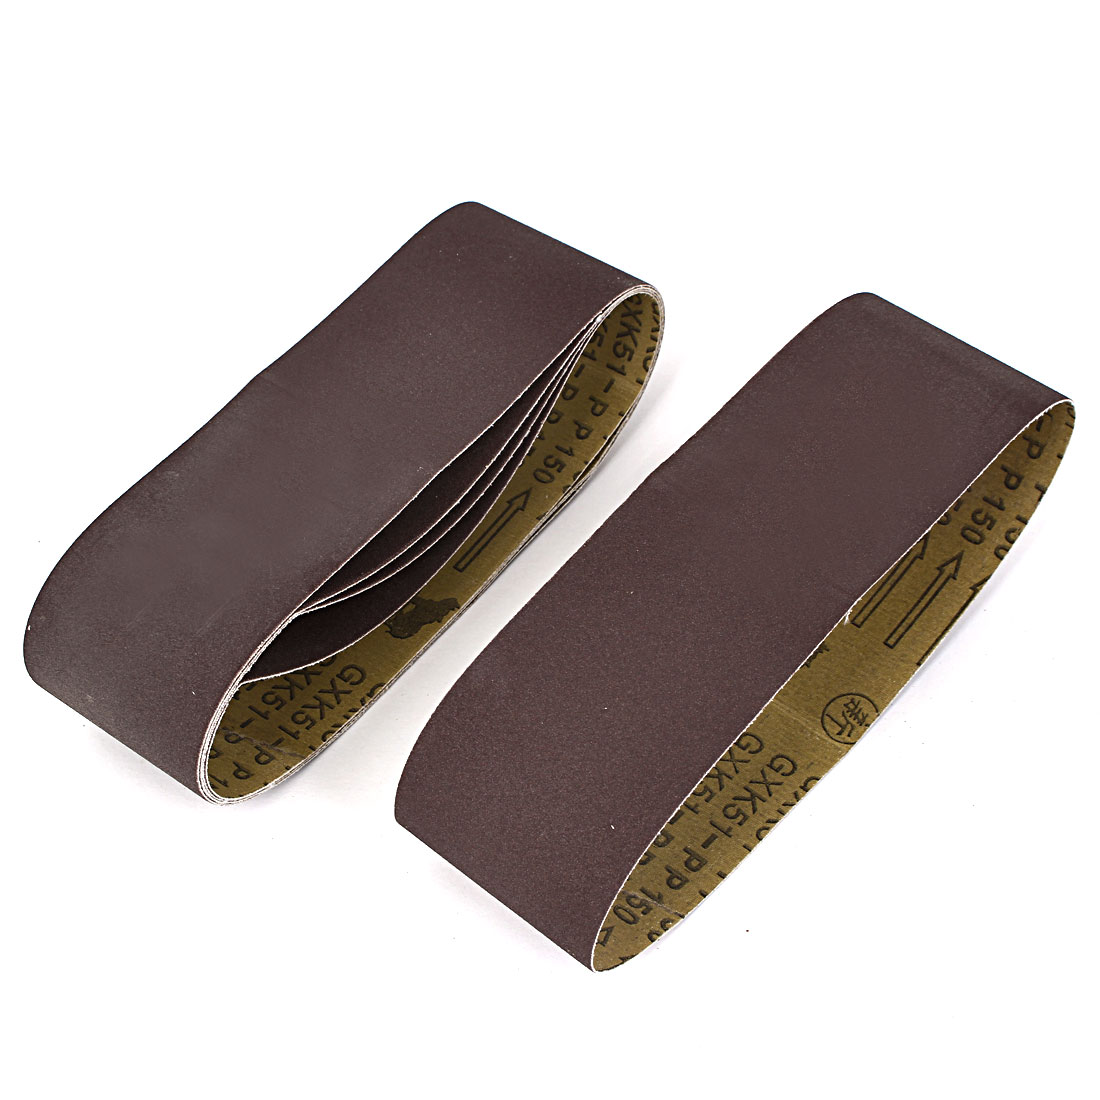 Woodworking 533mmx75mm 150 Grit Abrasive Sanding Belt Sandpaper 5pcs